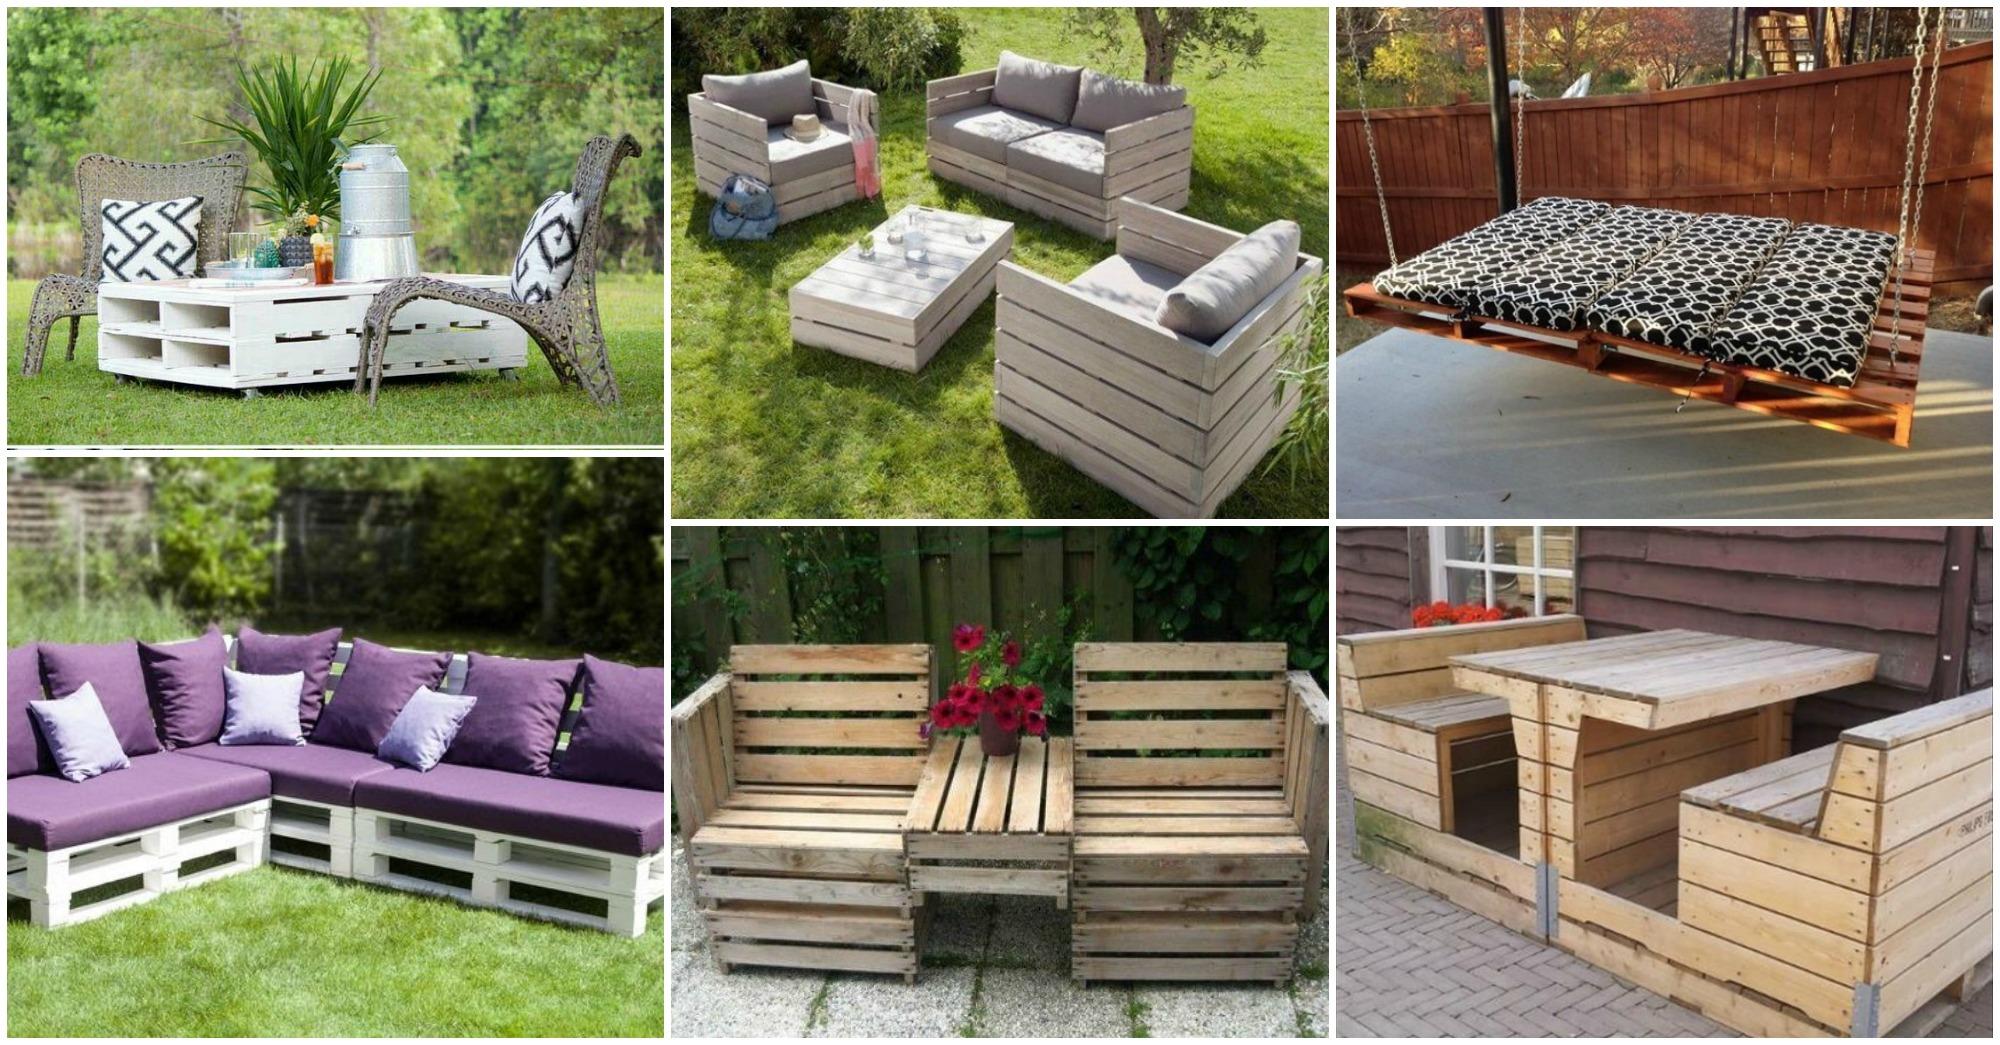 15 ingenious outdoor diy pallet projects for Idea deco guijarro exterior